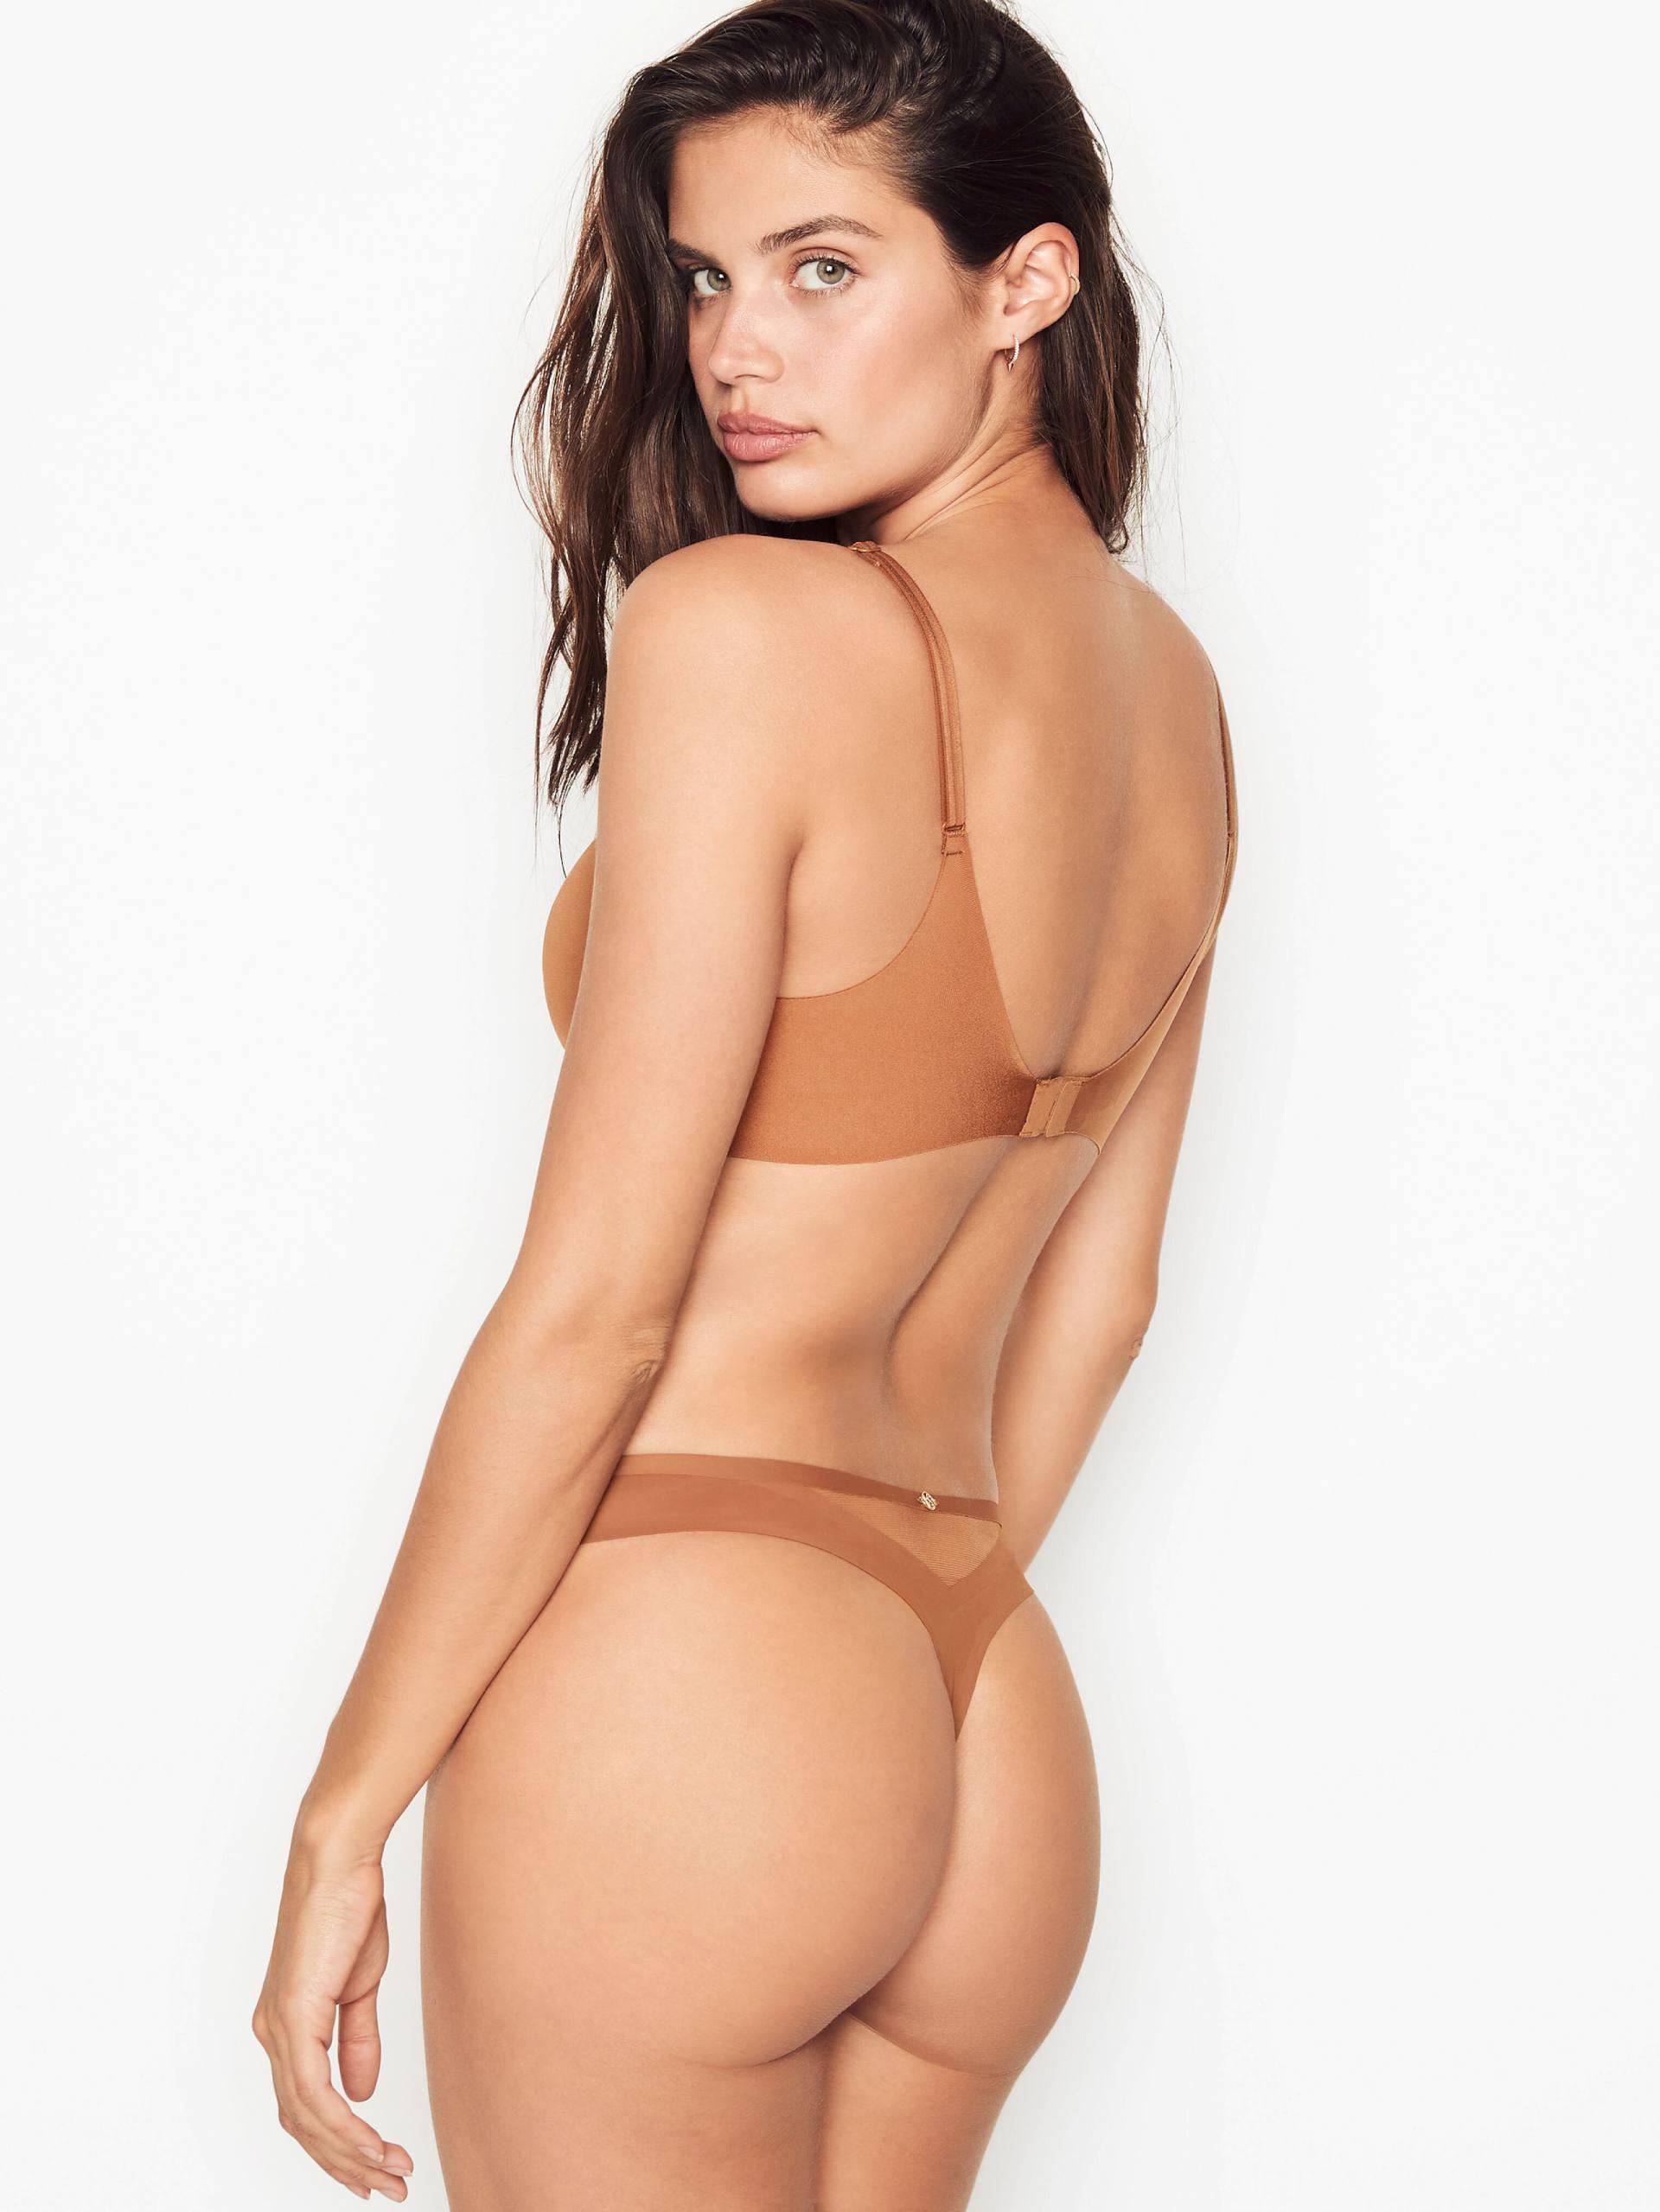 Sara Sampaio Beautiful Ass In Victoria's Secret Lingerie Photoshoot 0001